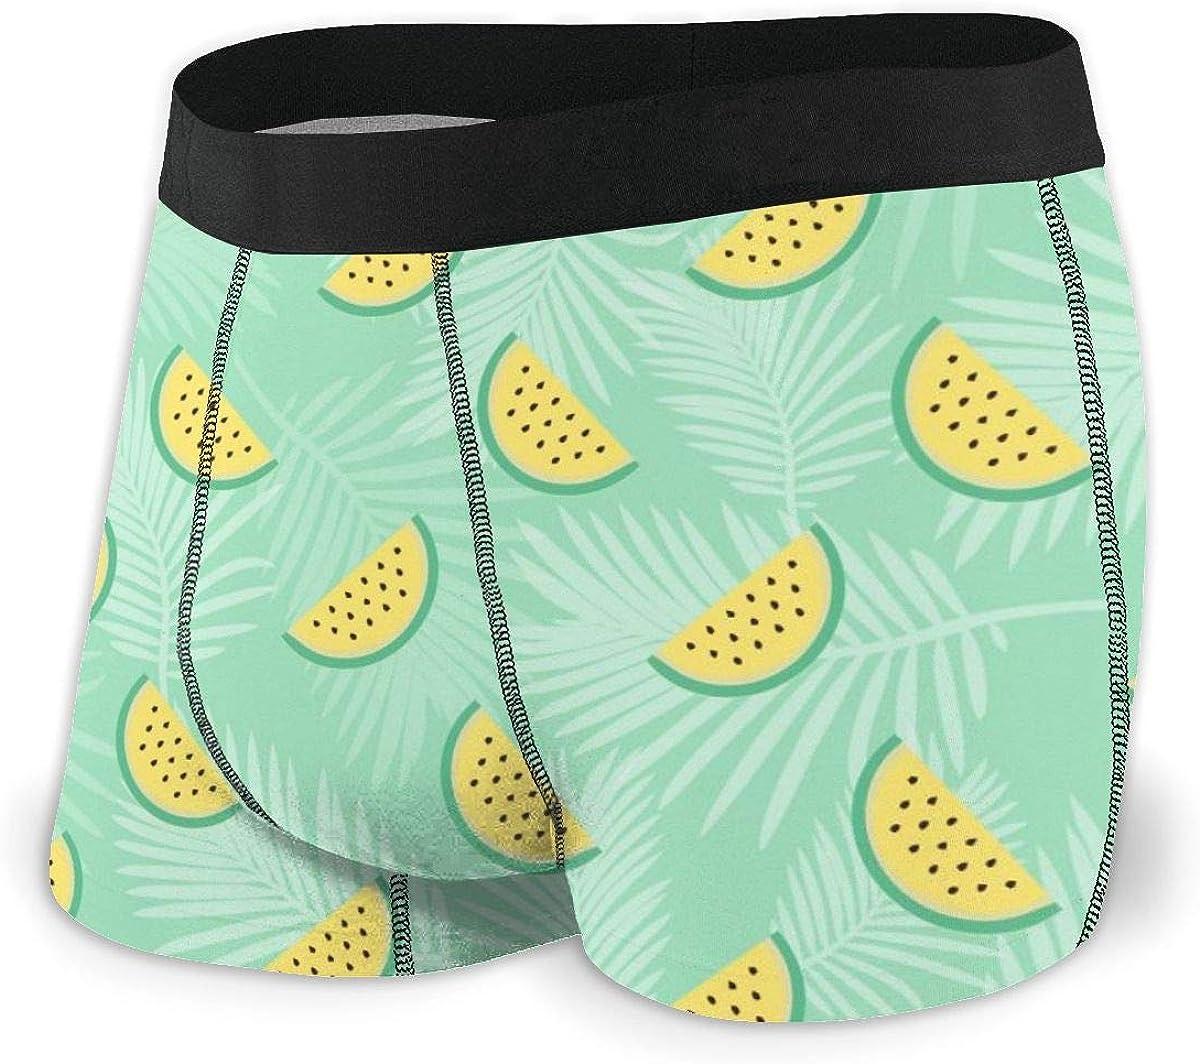 N /A Mens Boxer Briefs Watermelon Turquoise Green Boys Trunks Underwear Short Leg Breathable Man